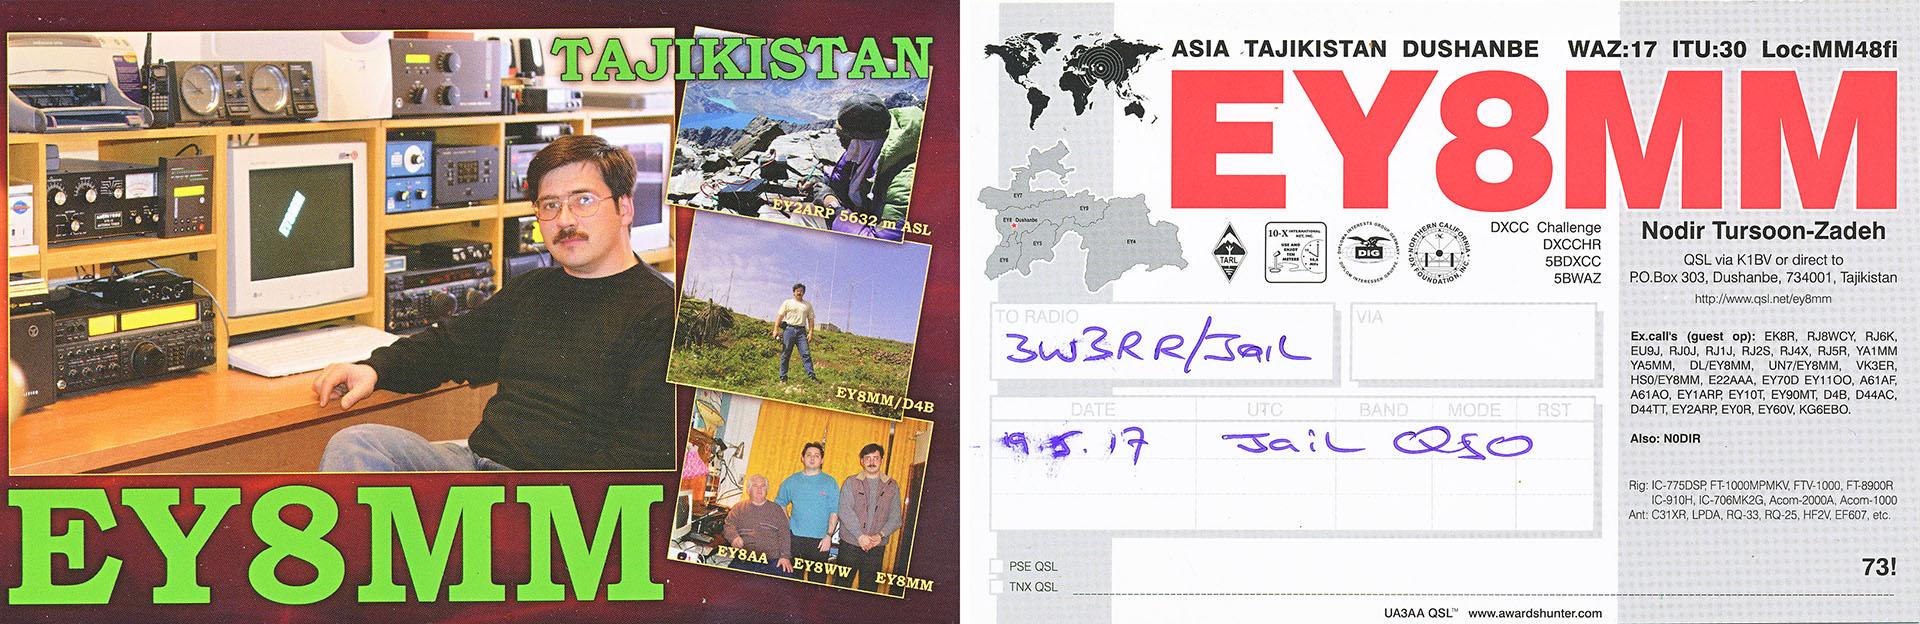 Нажмите на изображение для увеличения.  Название:EY8MM-3W3RR-QSL-2017.jpg Просмотров:8 Размер:378.6 Кб ID:190473